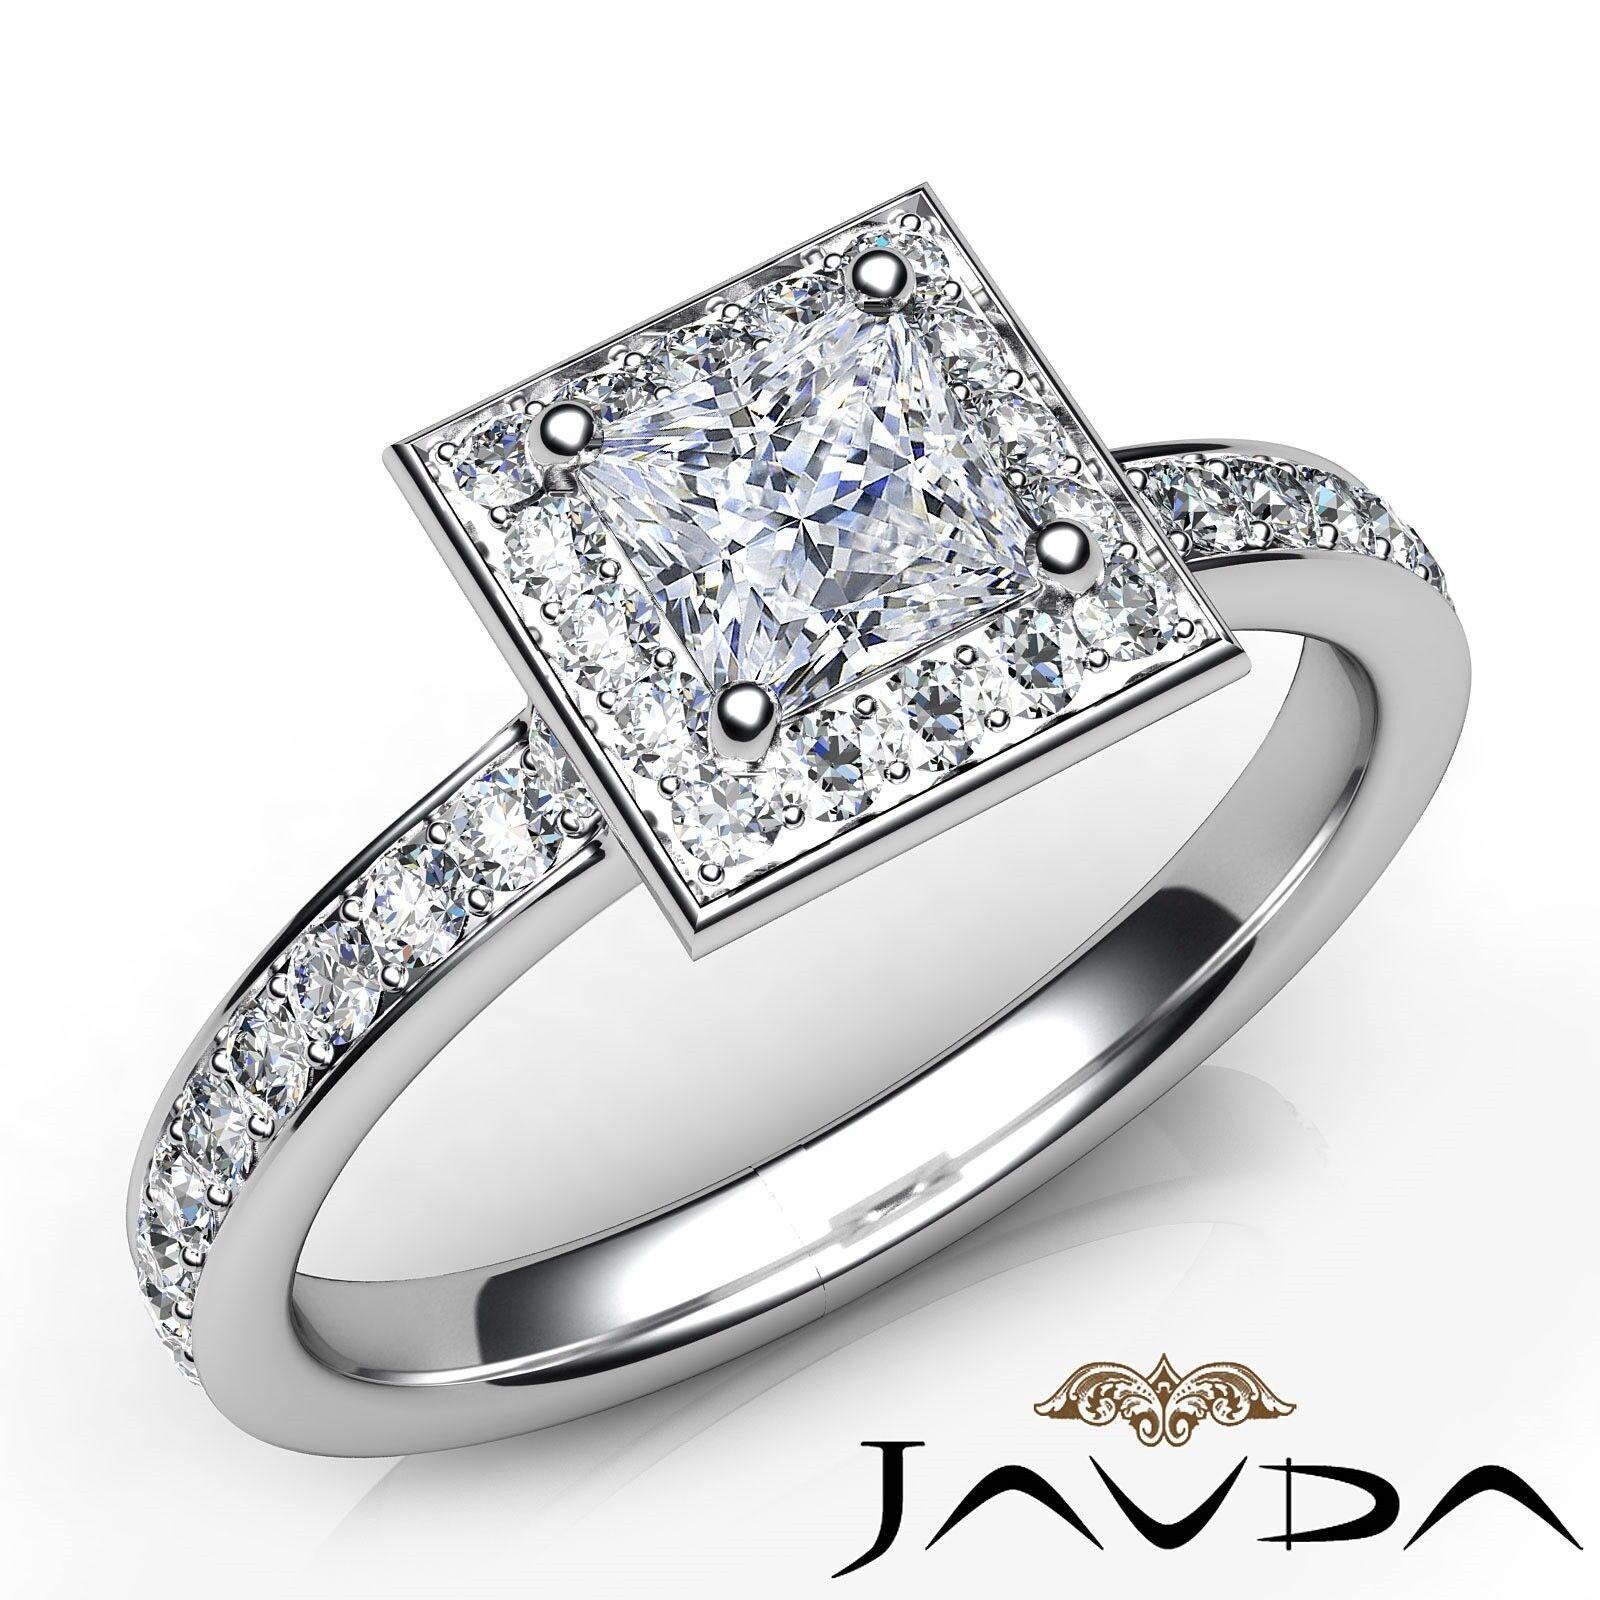 1.06ctw Gala Halo Pave Princess Diamond Engagement Ring GIA F-VVS1 White Gold